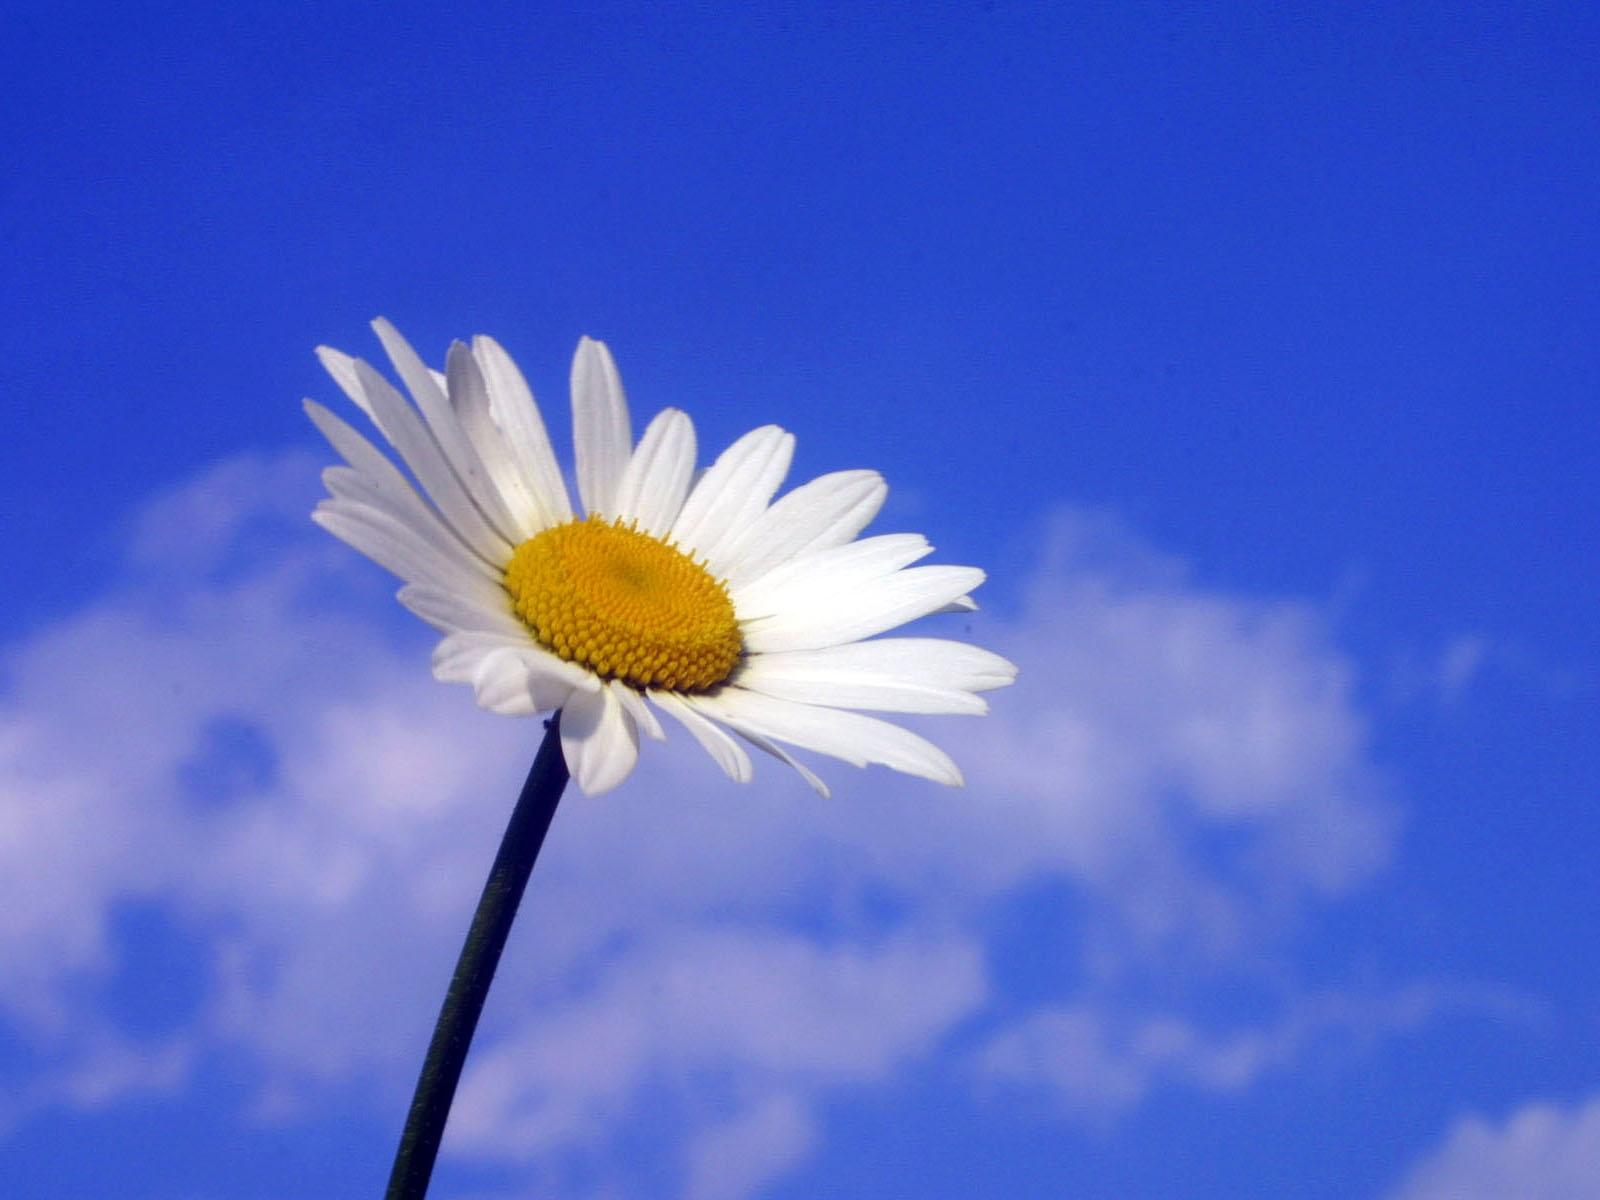 Top White Daisy Photo 13082 - HDWPro